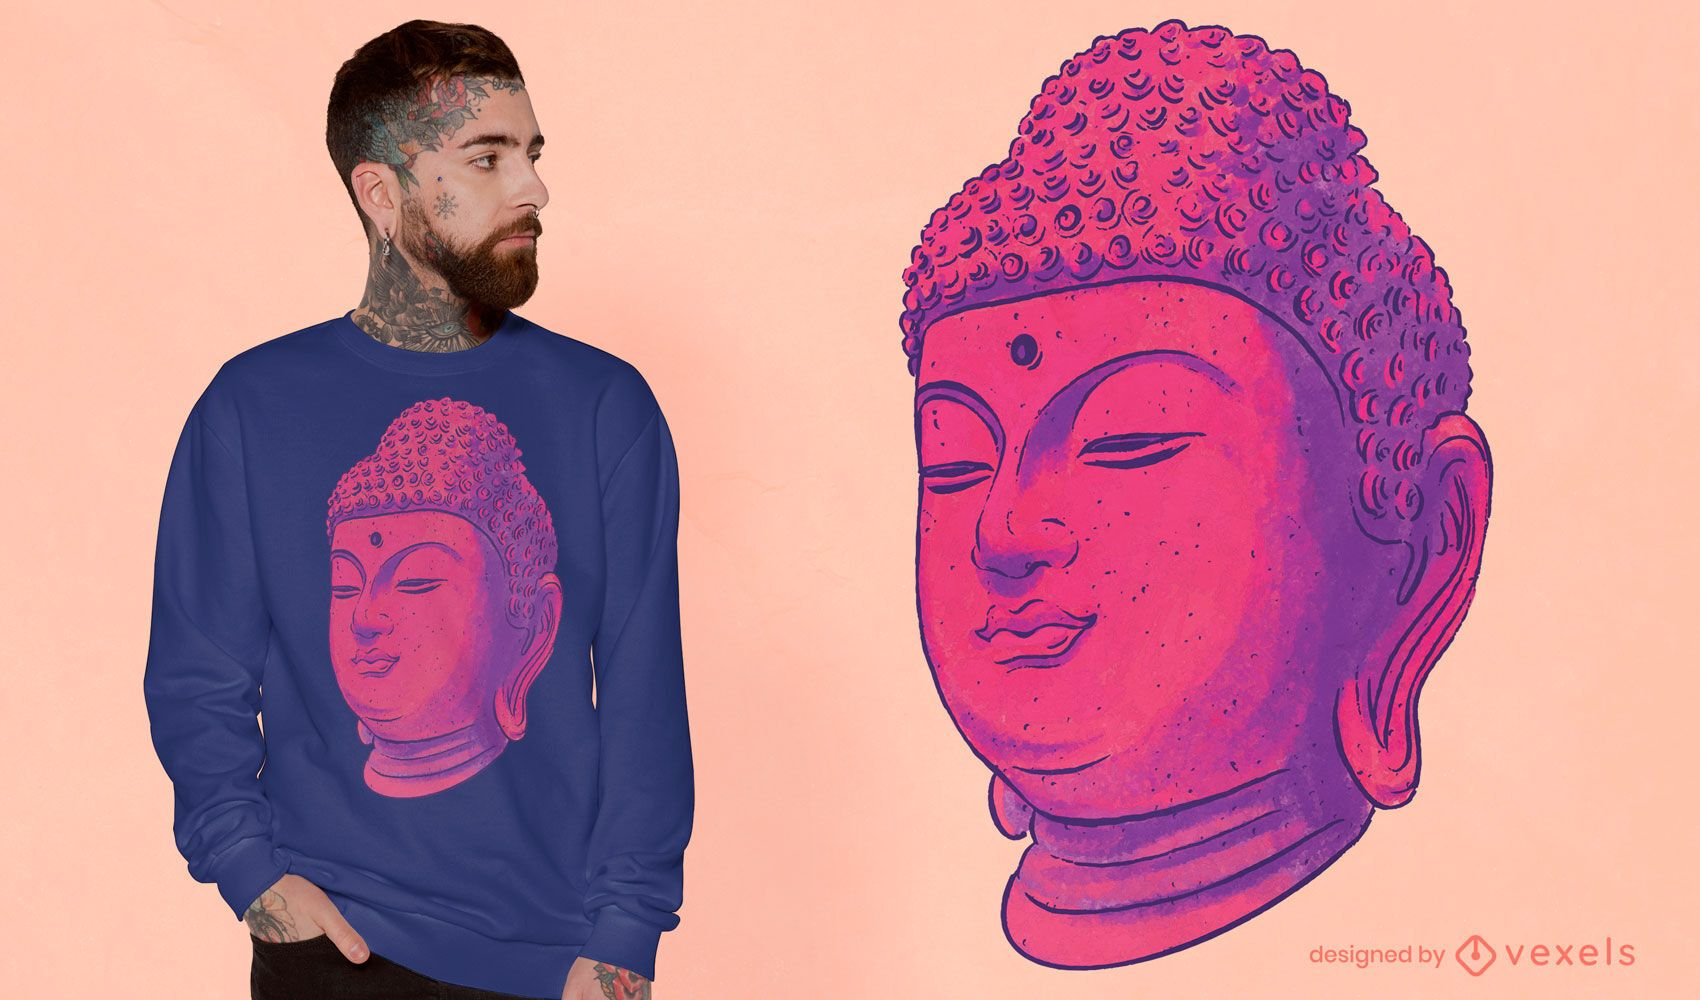 Colorful Buddha t-shirt design